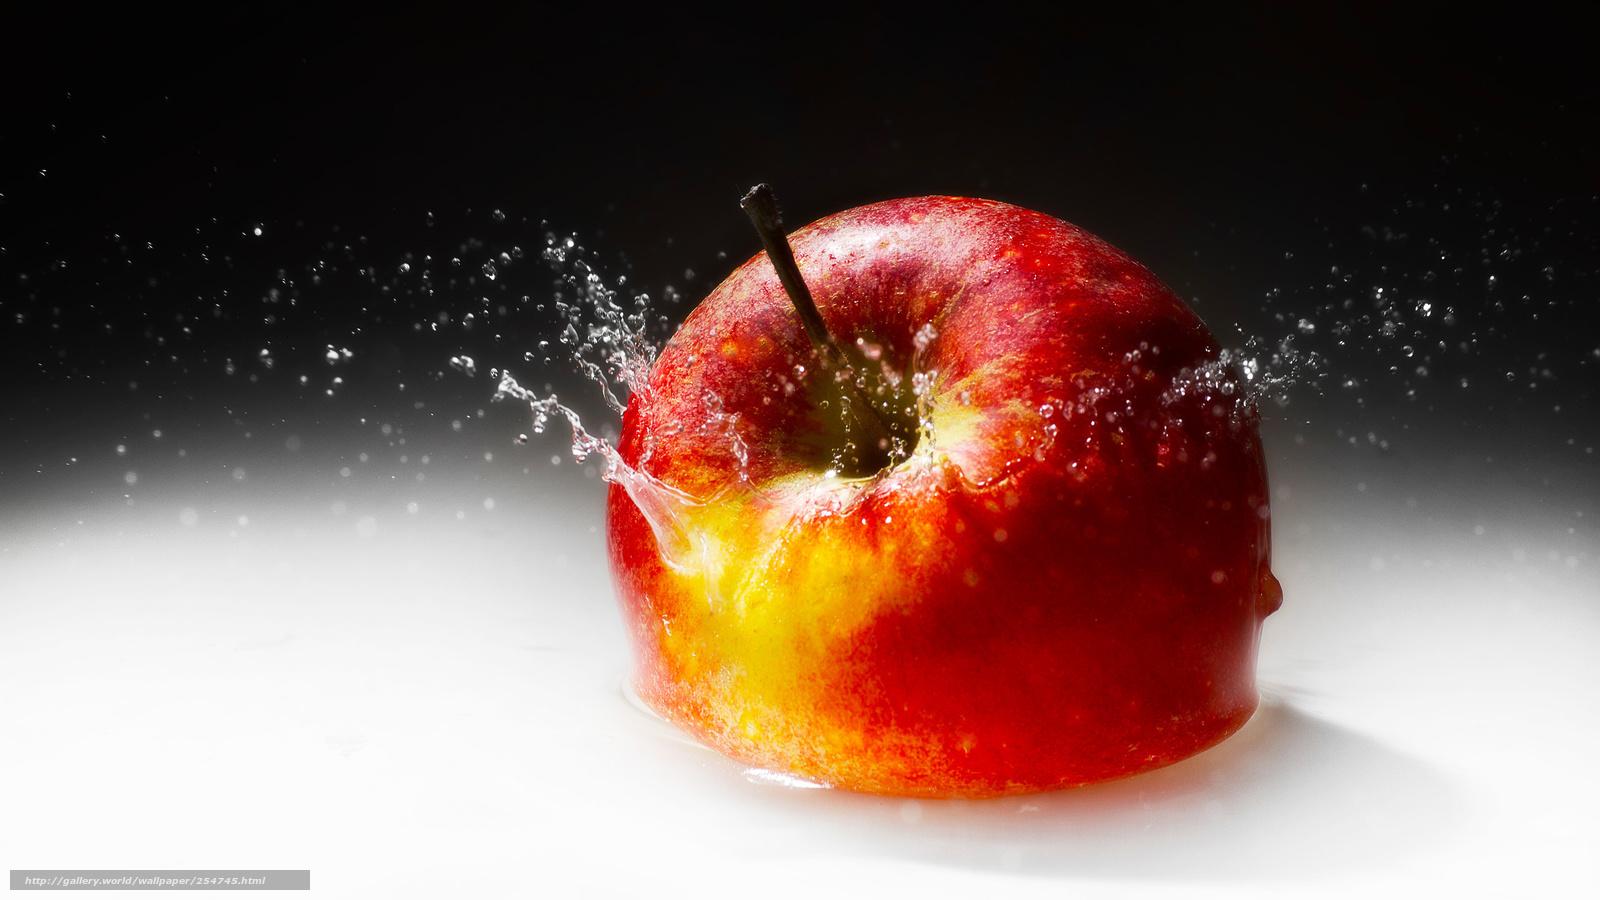 Apple fruit images download - Download Wallpaper Apple Fruit Beauty Free Desktop Wallpaper In The Resolution 2560x1440 Picture 254745